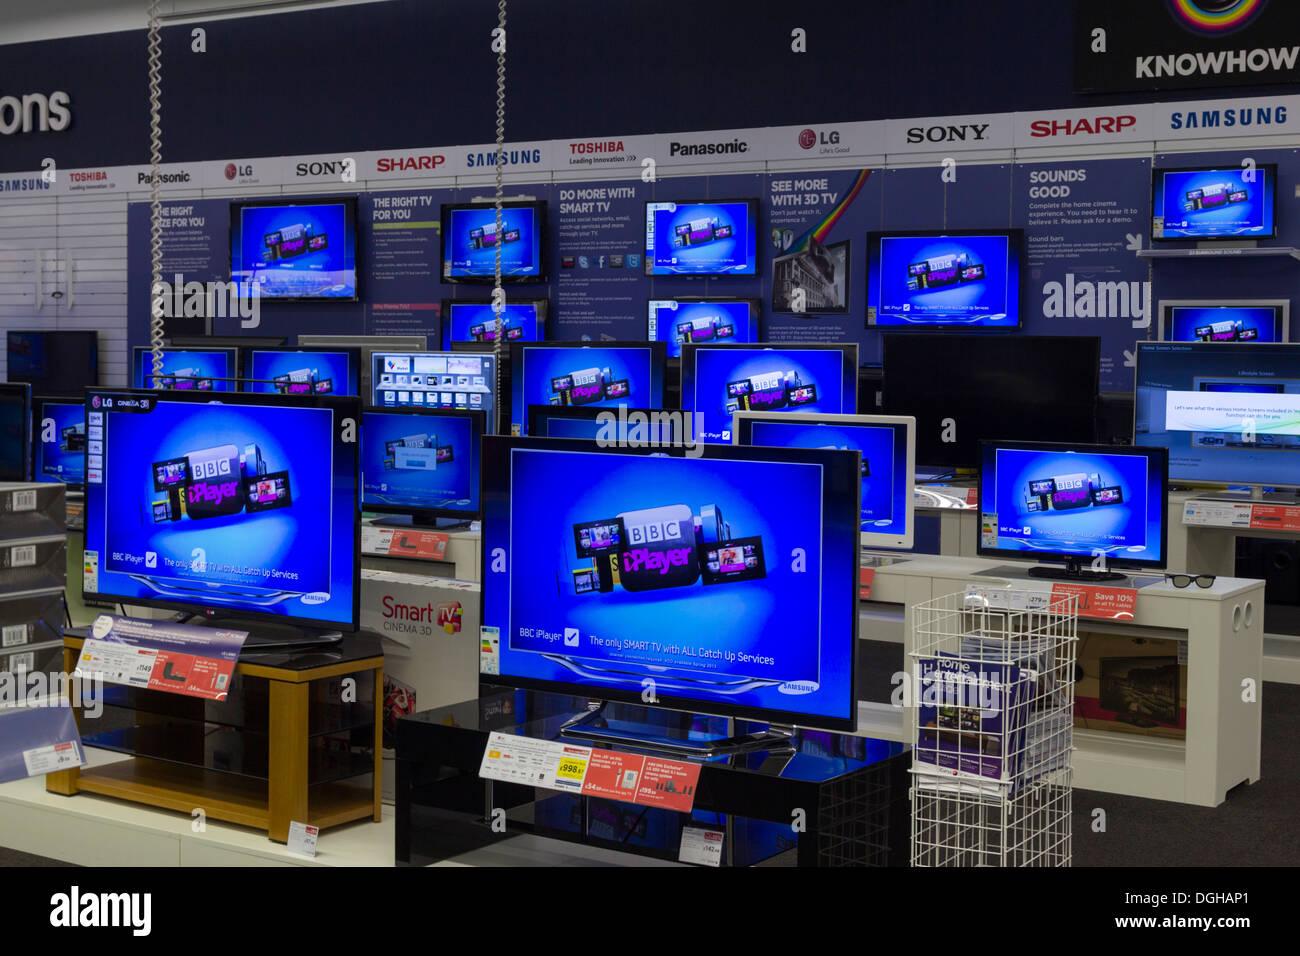 Currys Electrical Store - Friern Barnet - London - Stock Image